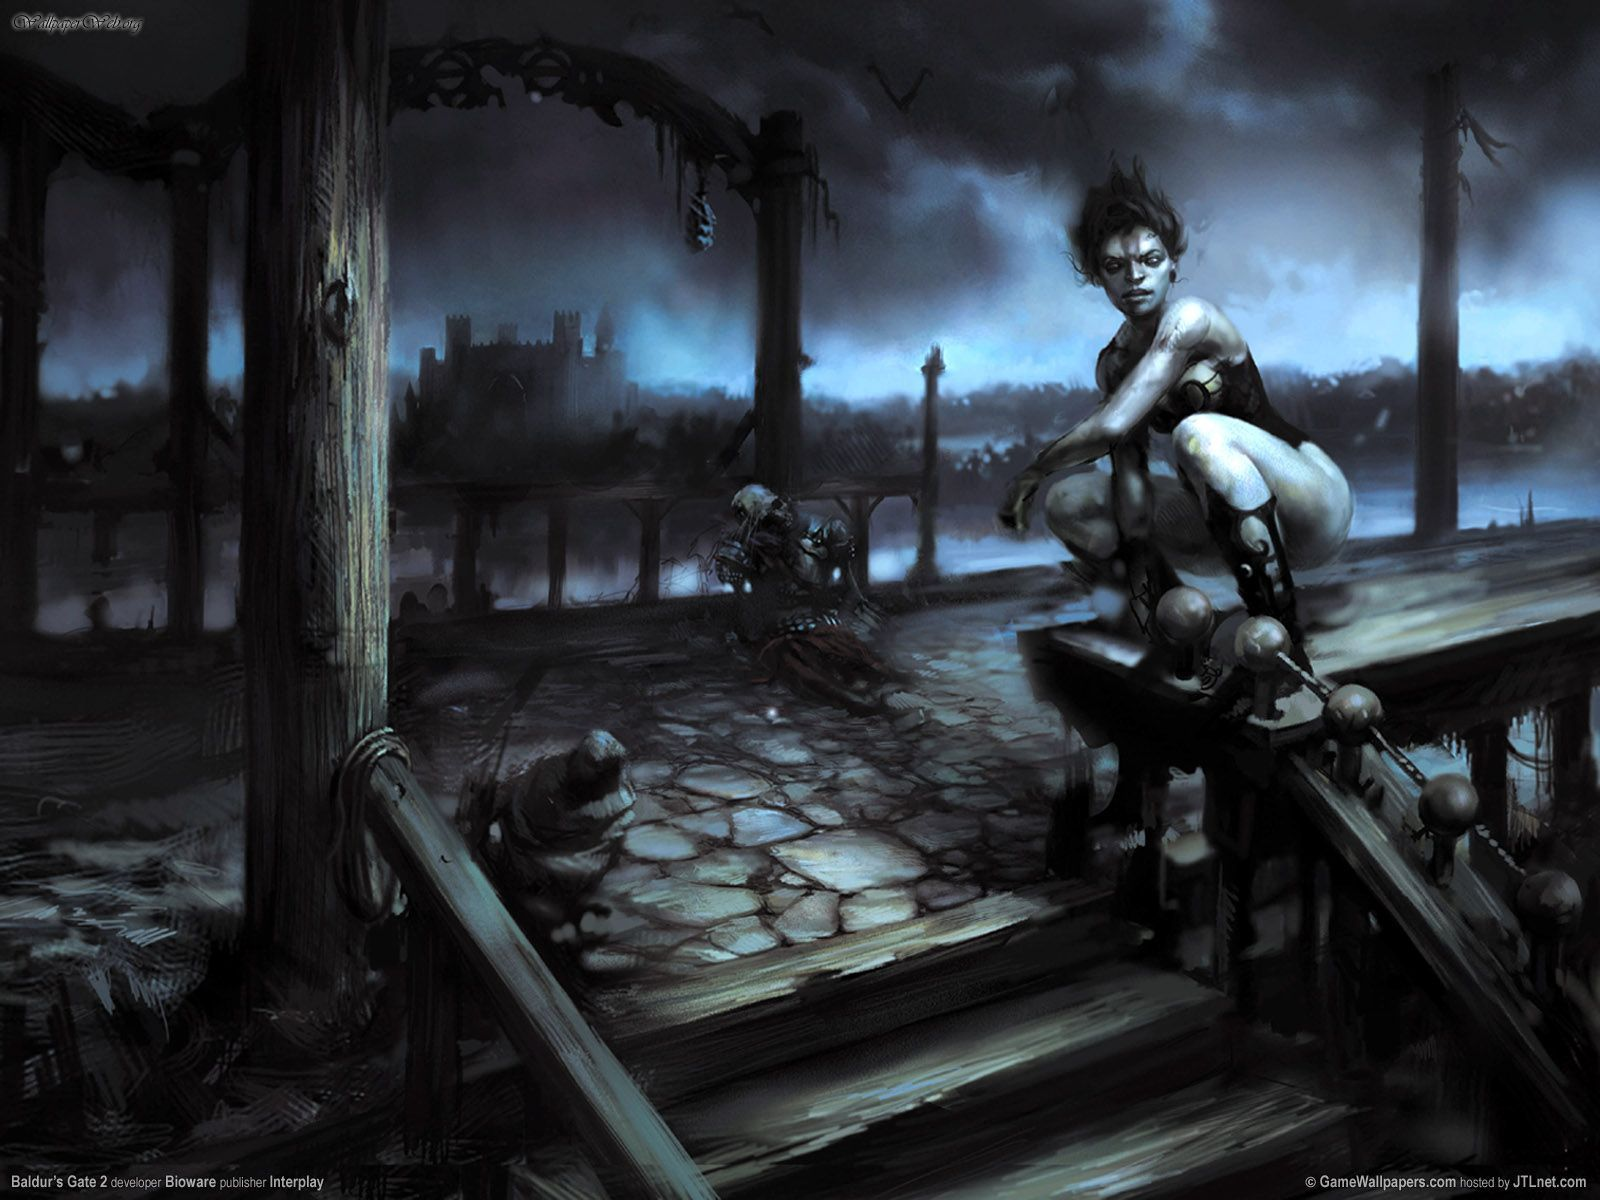 Baldurs Gate Ii Shadows Of Amn In 2019 Baldurs Gate Art